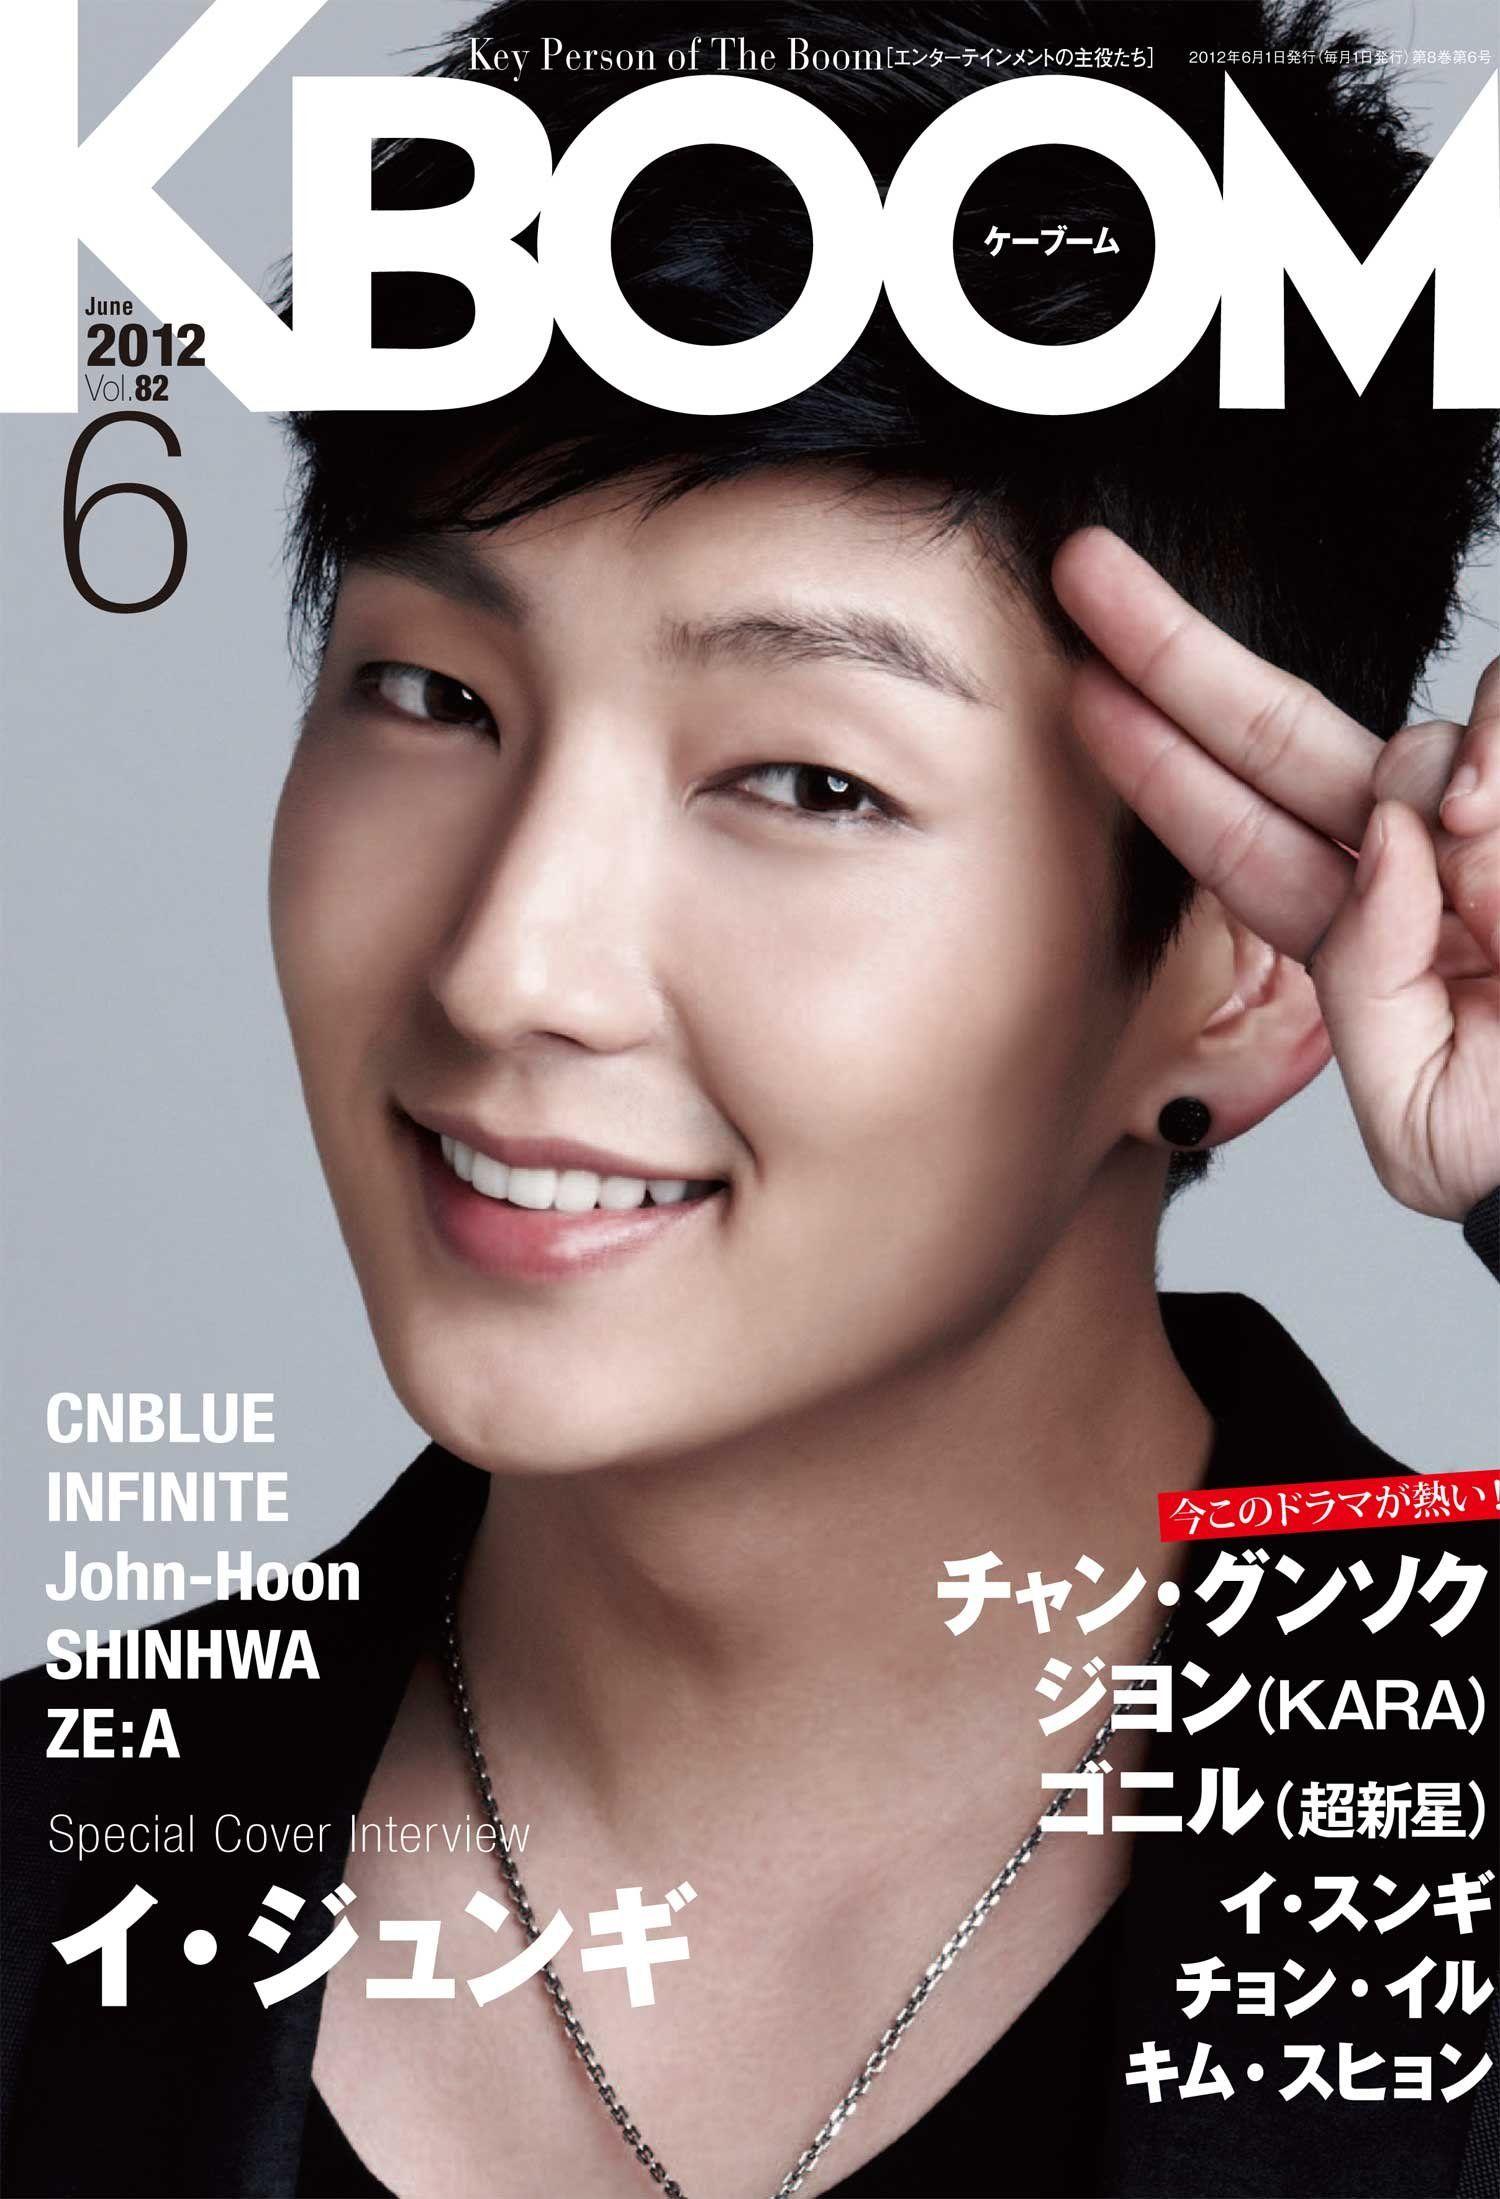 https//www.amazon.co.jp/KBOOMケーブーム2012年6月号【雑誌】/dp